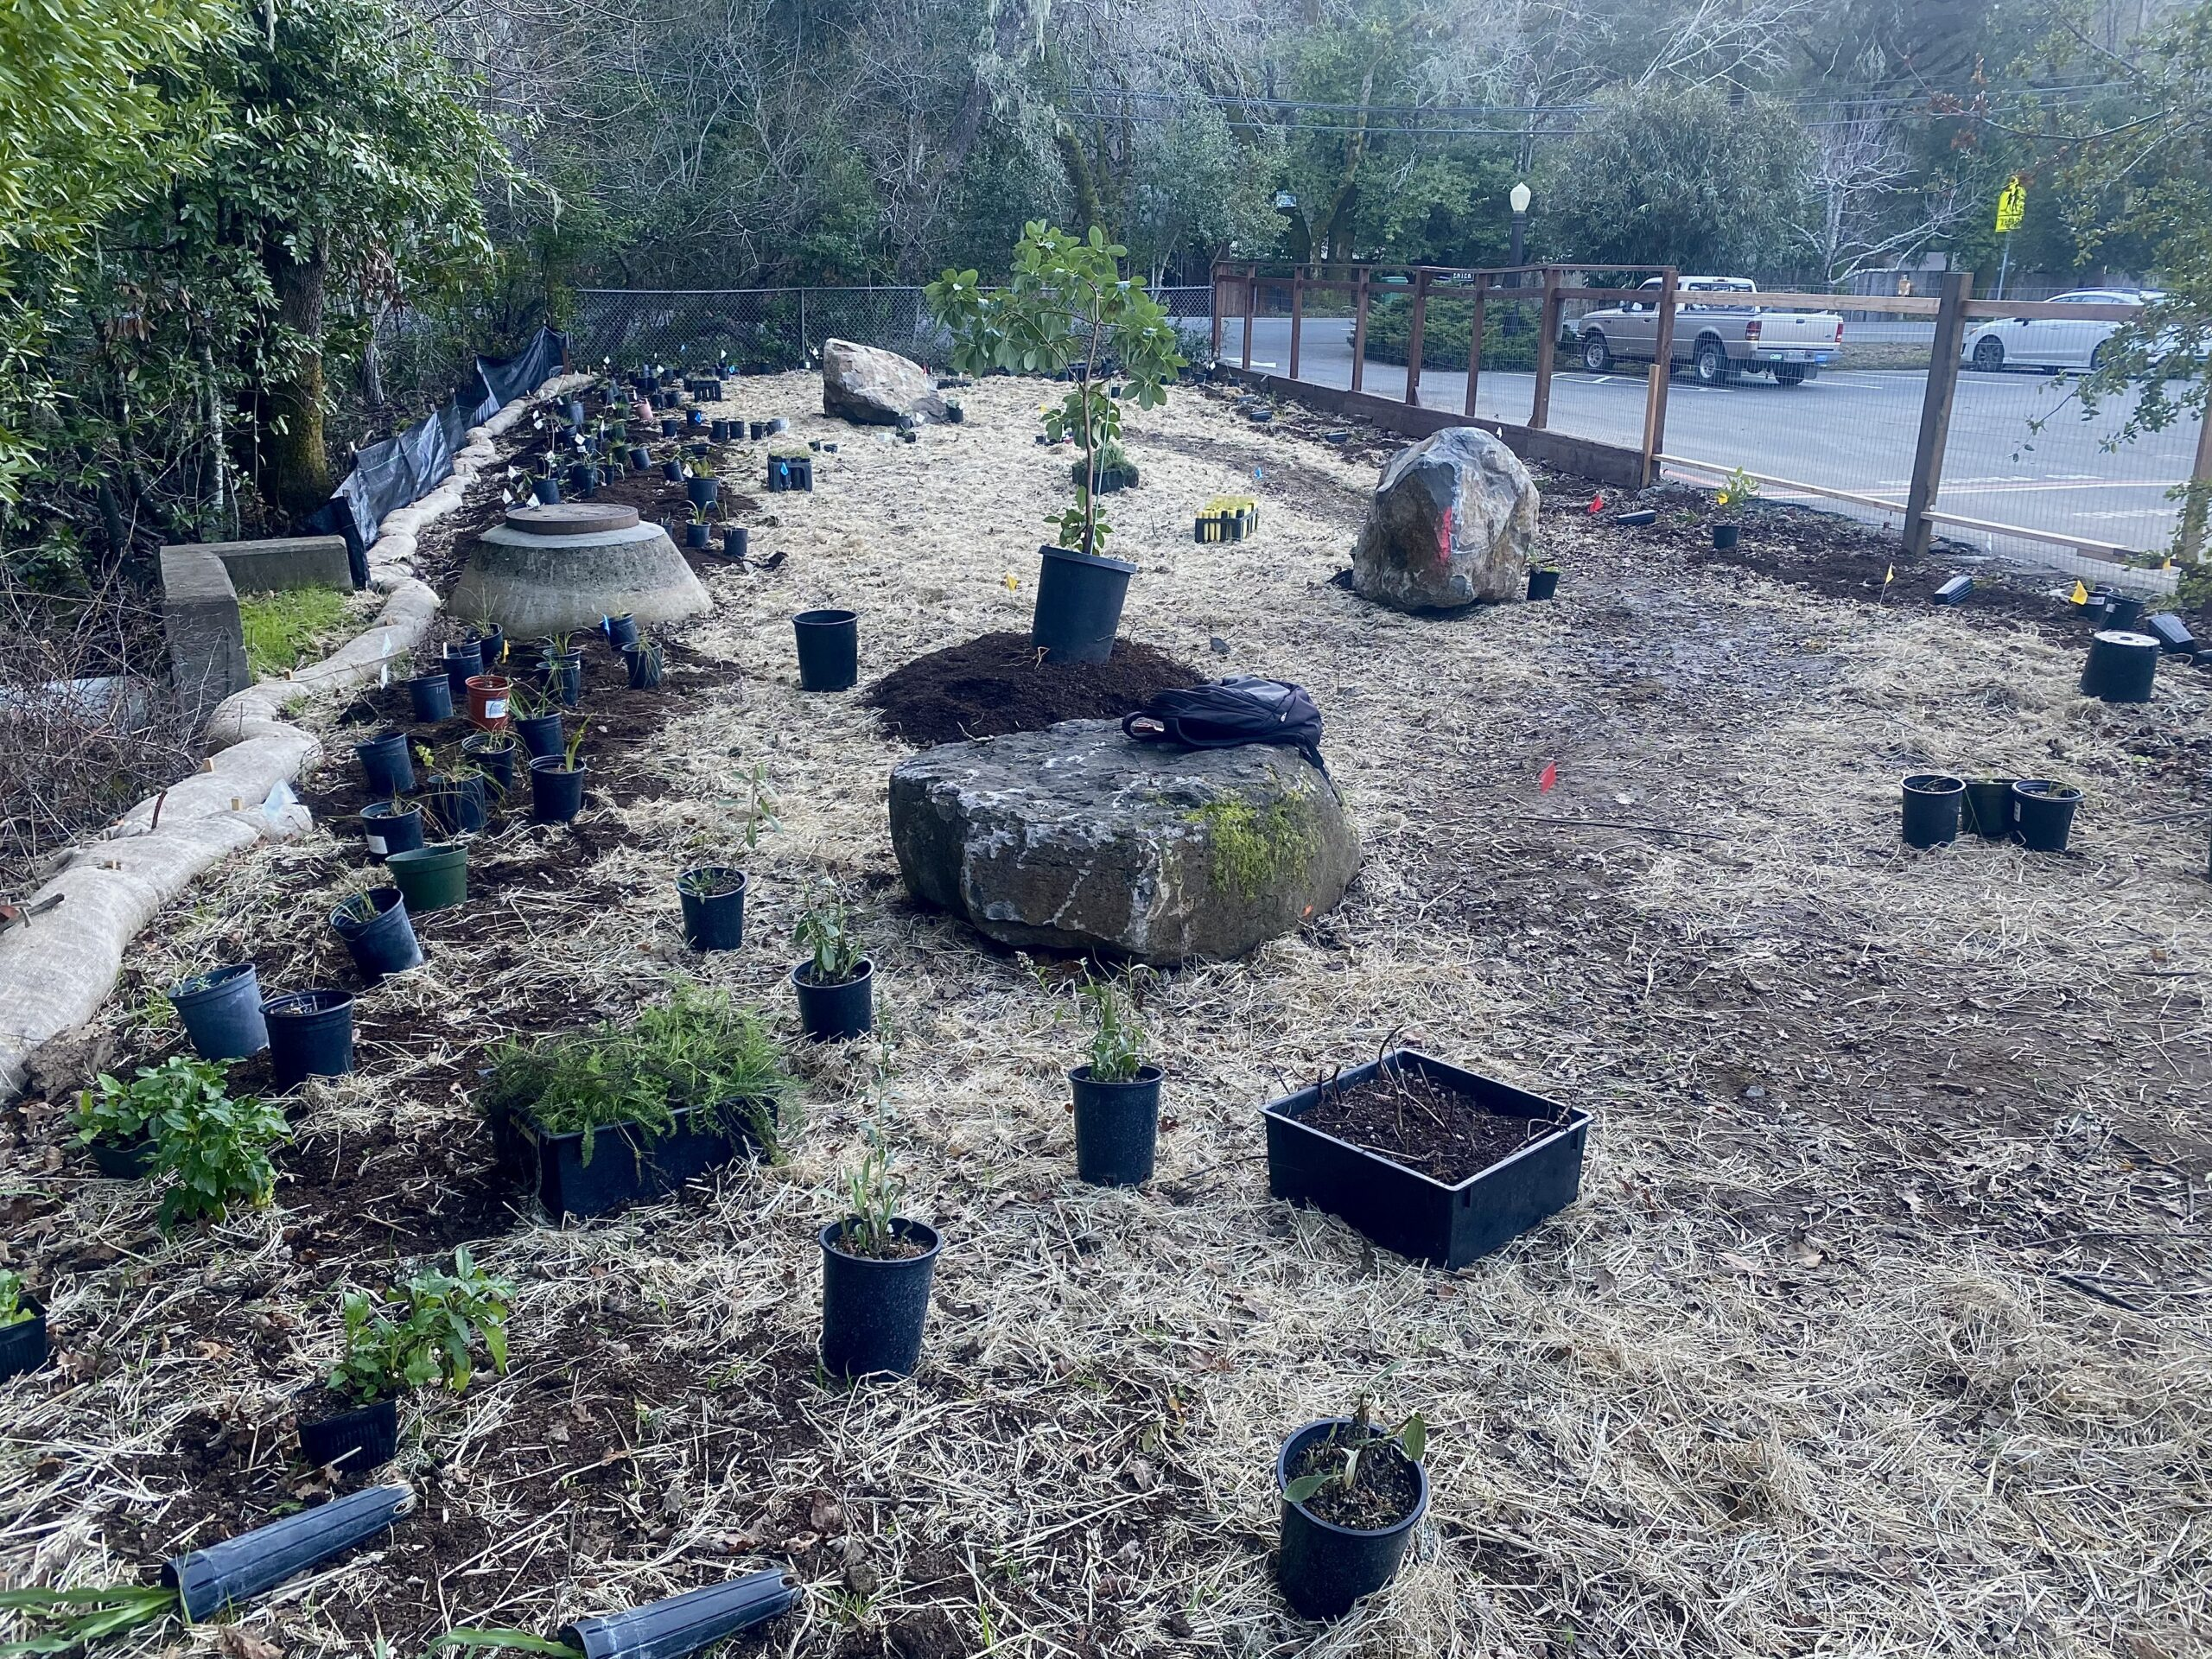 SPAWN Plants Habitat Garden at the San Geronimo Valley Community Center